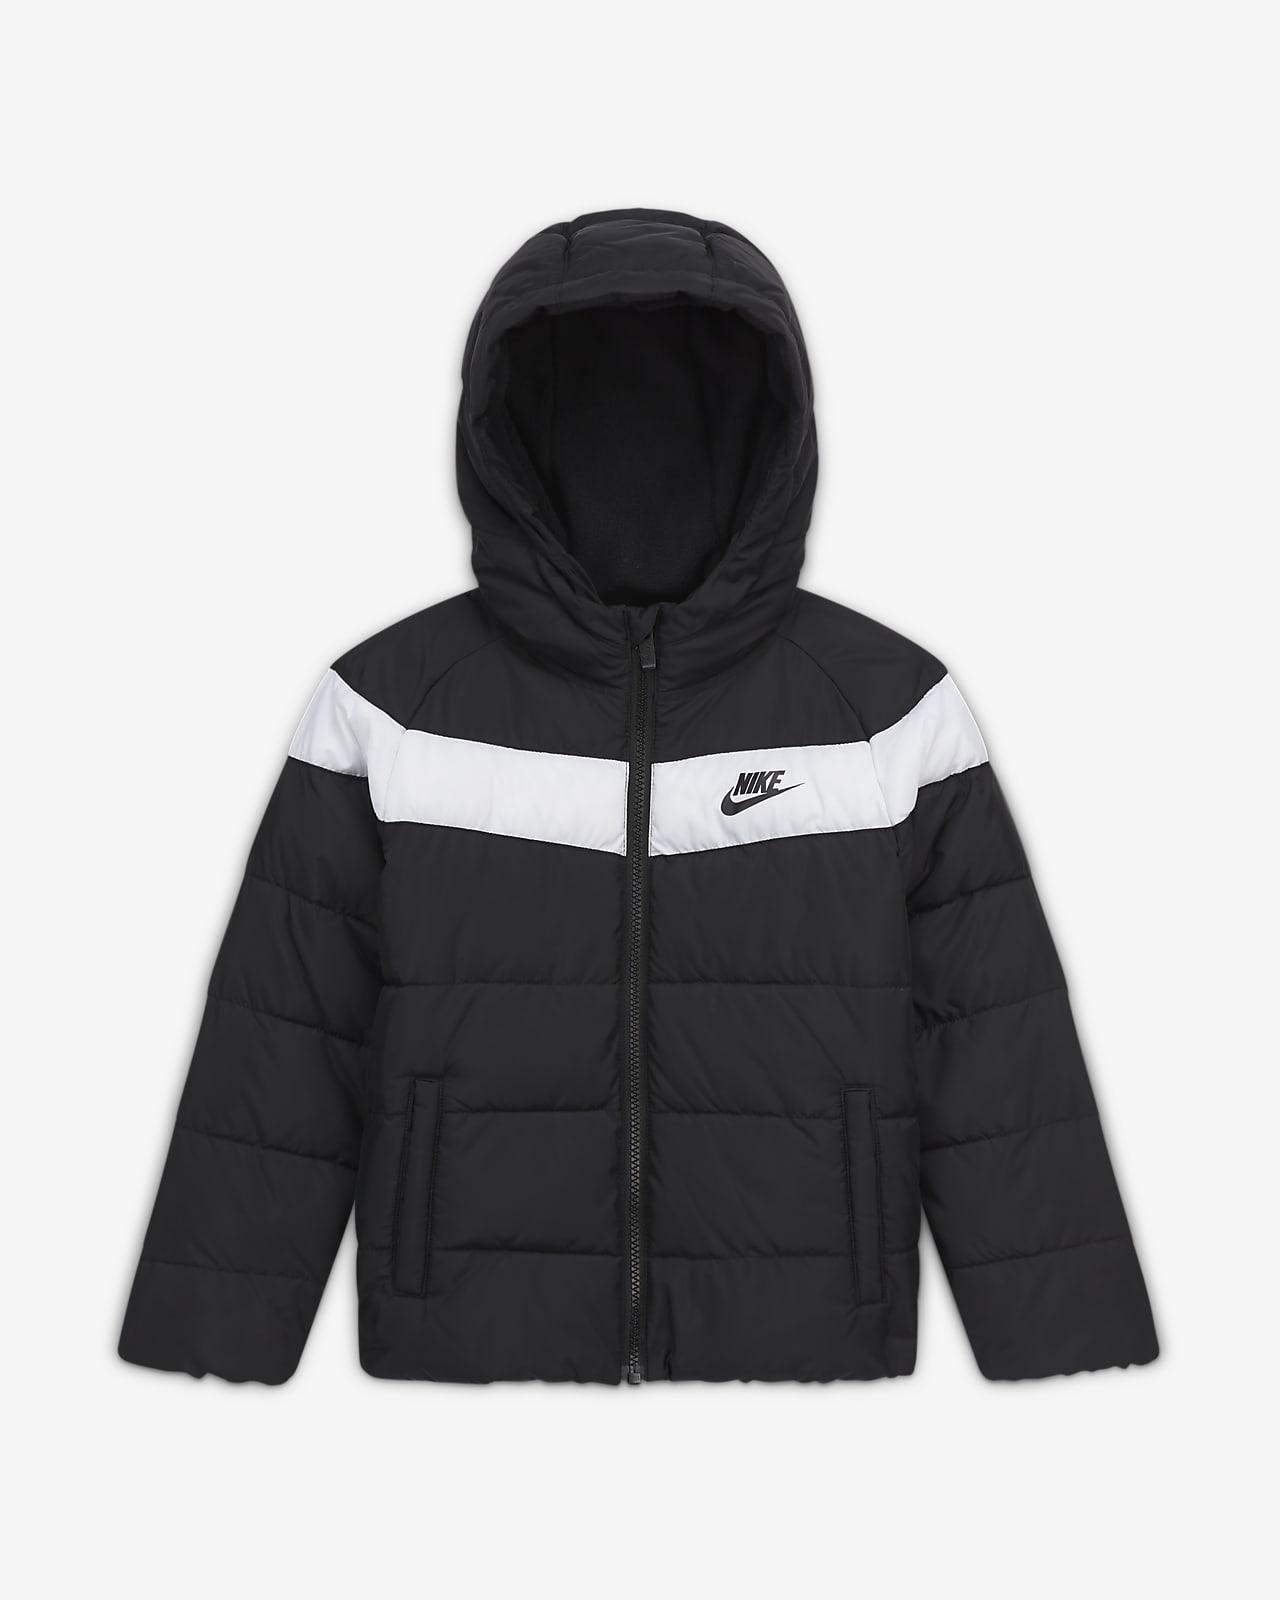 Adaptado Me gusta Rudyard Kipling  Nike Chaqueta acolchada - Niño/a pequeño/a. Nike ES